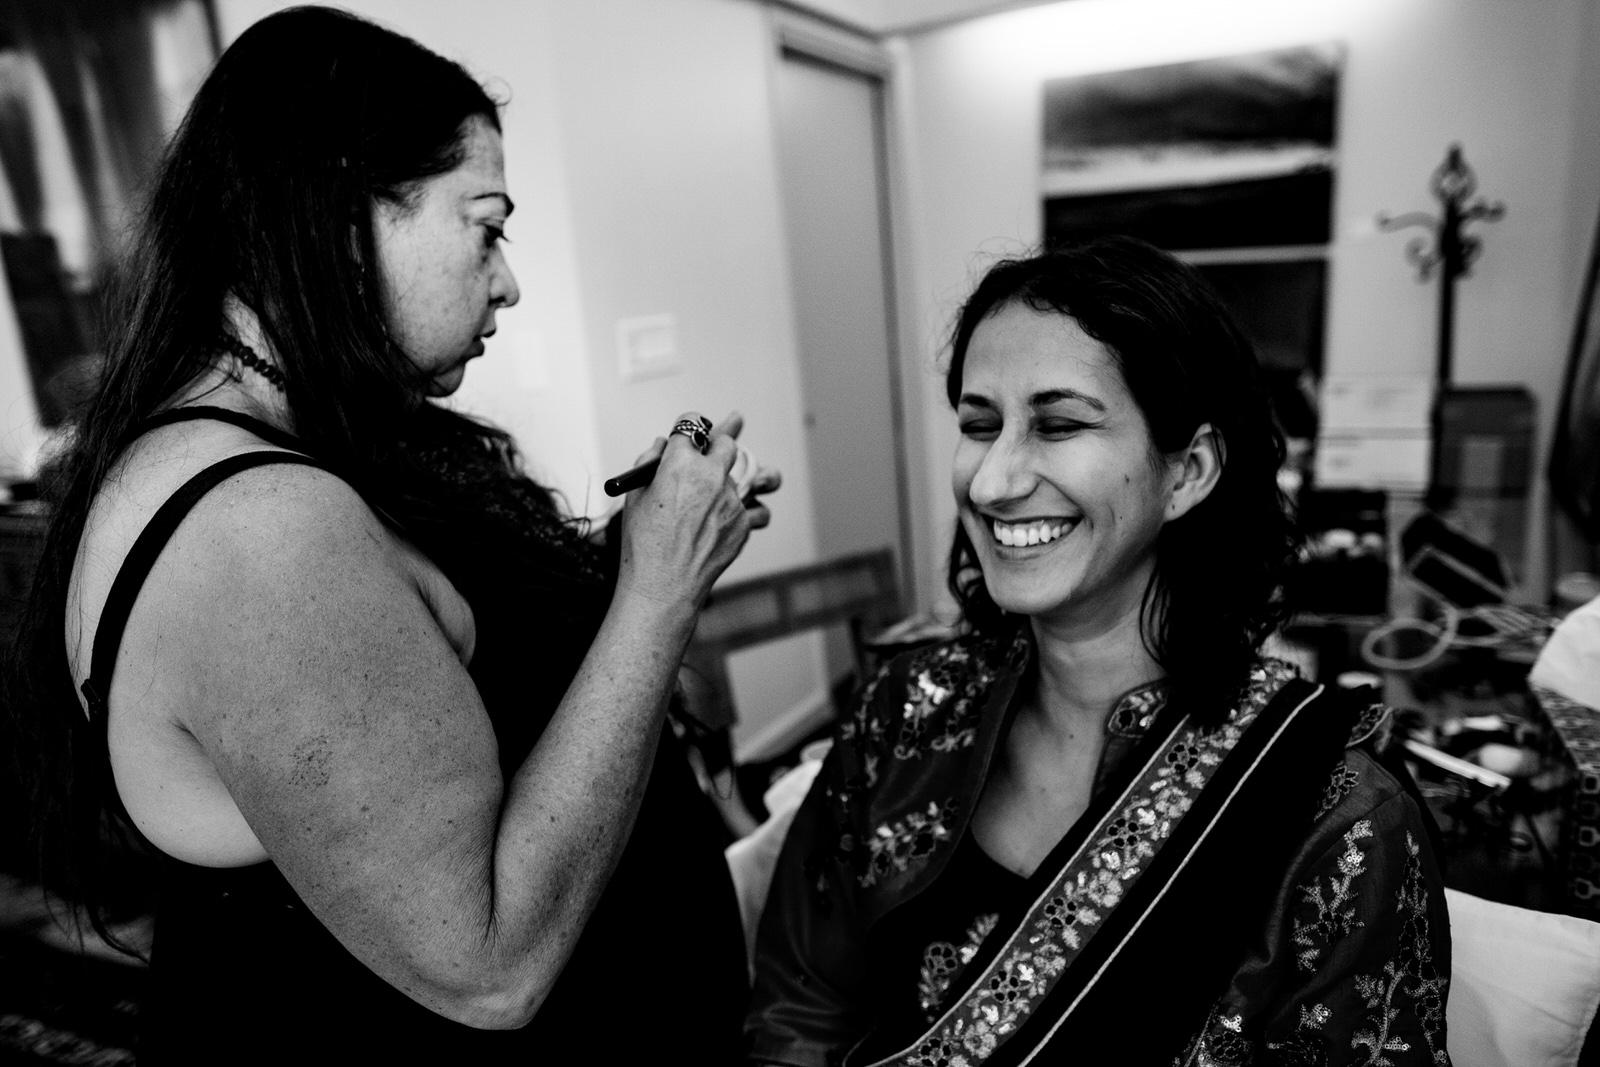 makeup-getting-ready-saturday-kashi-ashram-tiny-house-photo-orlando-wedding-photographer